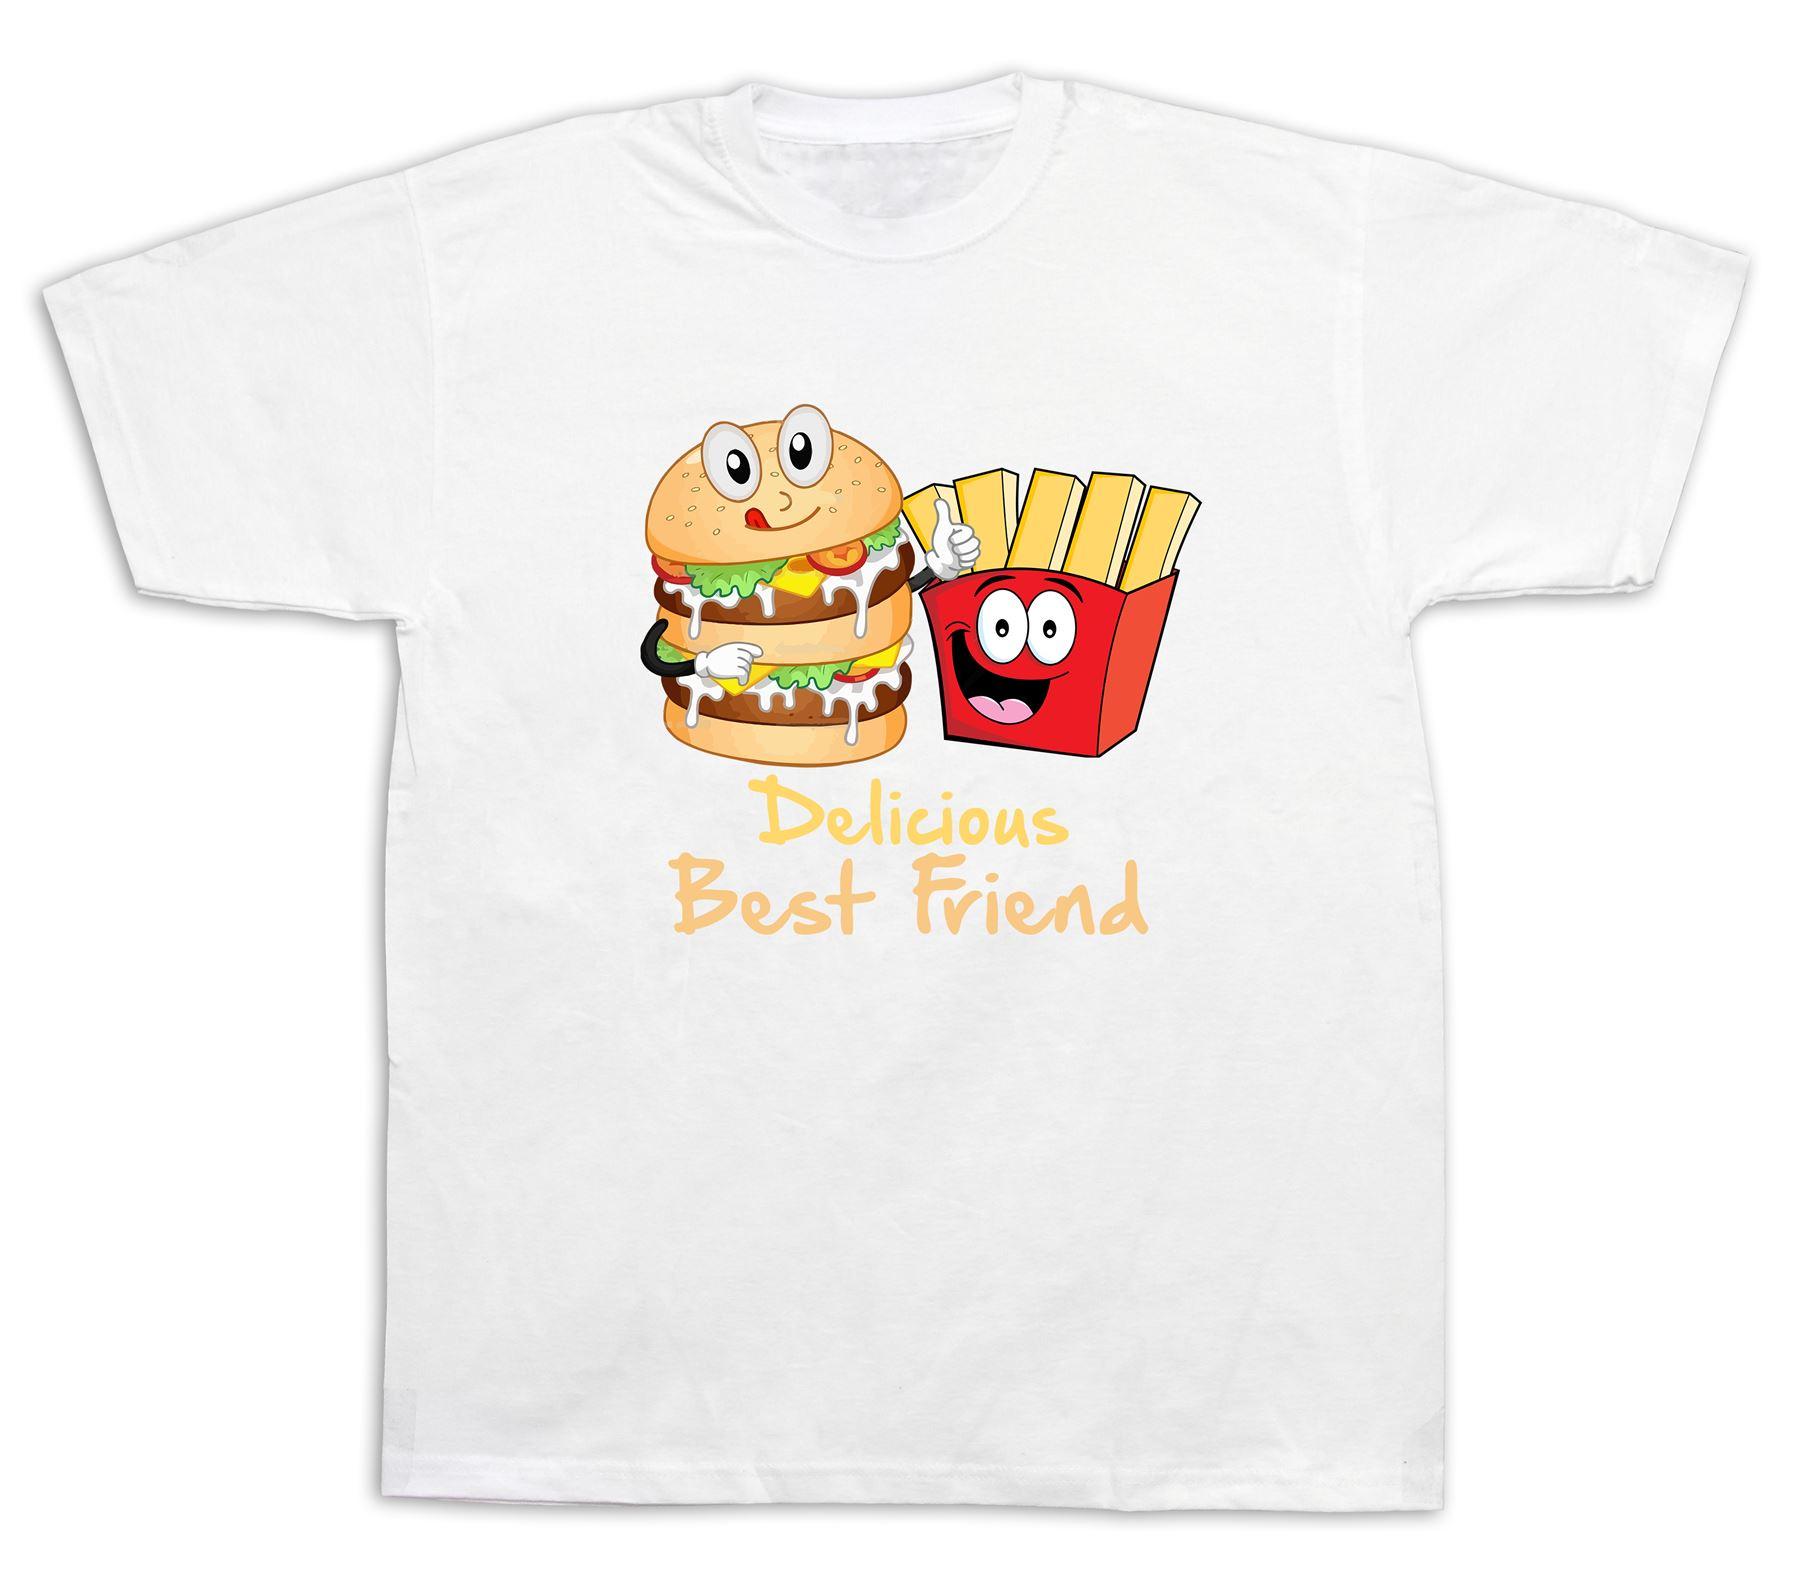 delicious burger chips best friend bff t shirt fast mix. Black Bedroom Furniture Sets. Home Design Ideas